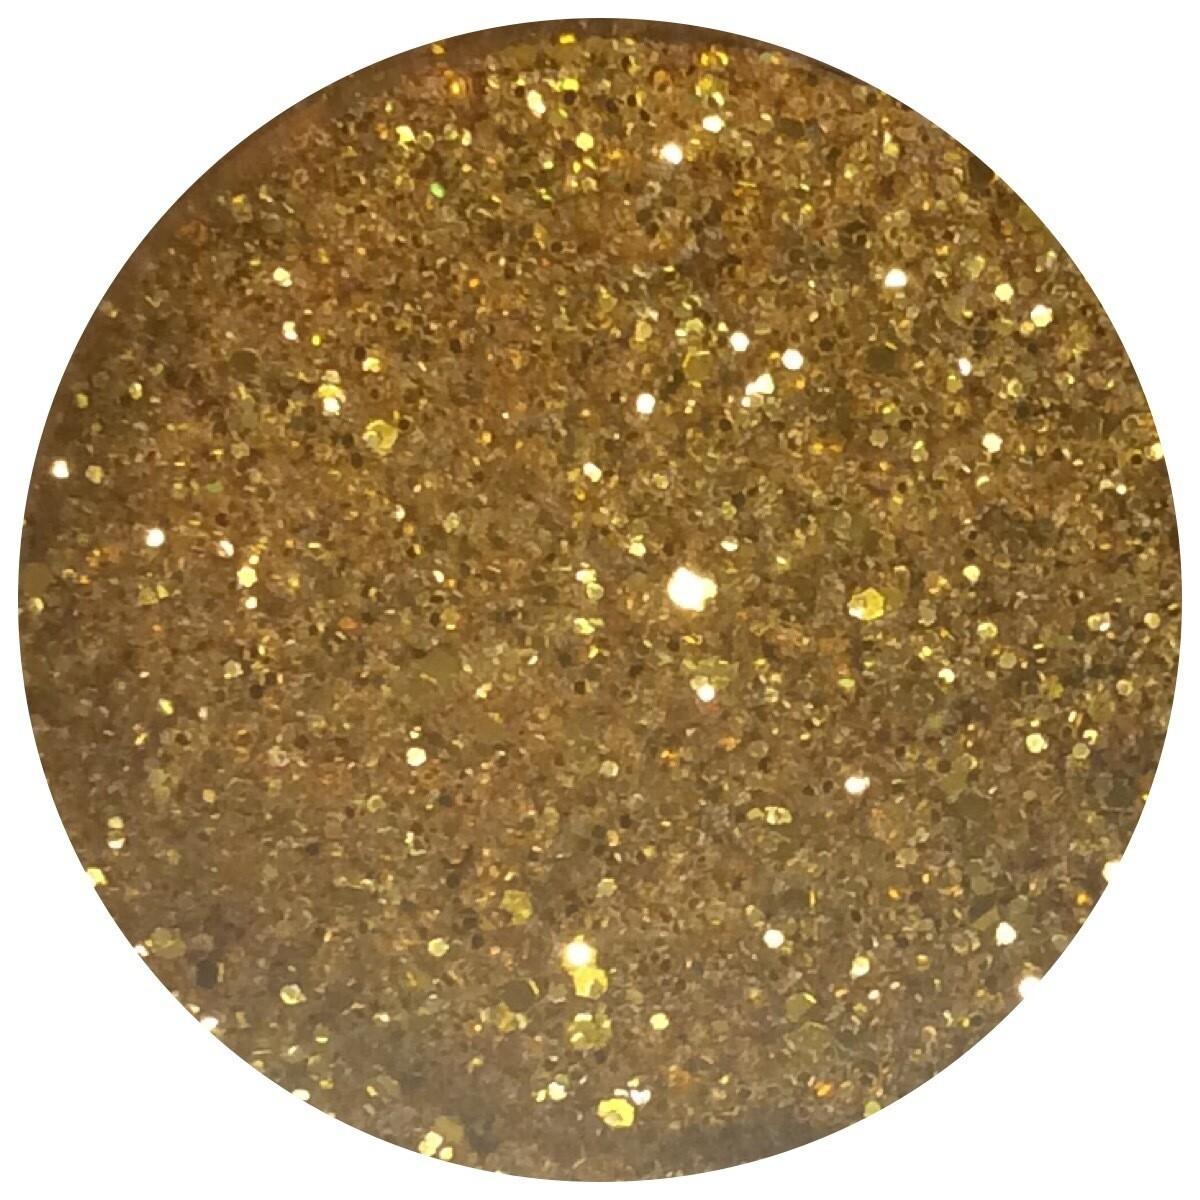 Dazzling gold Glitter